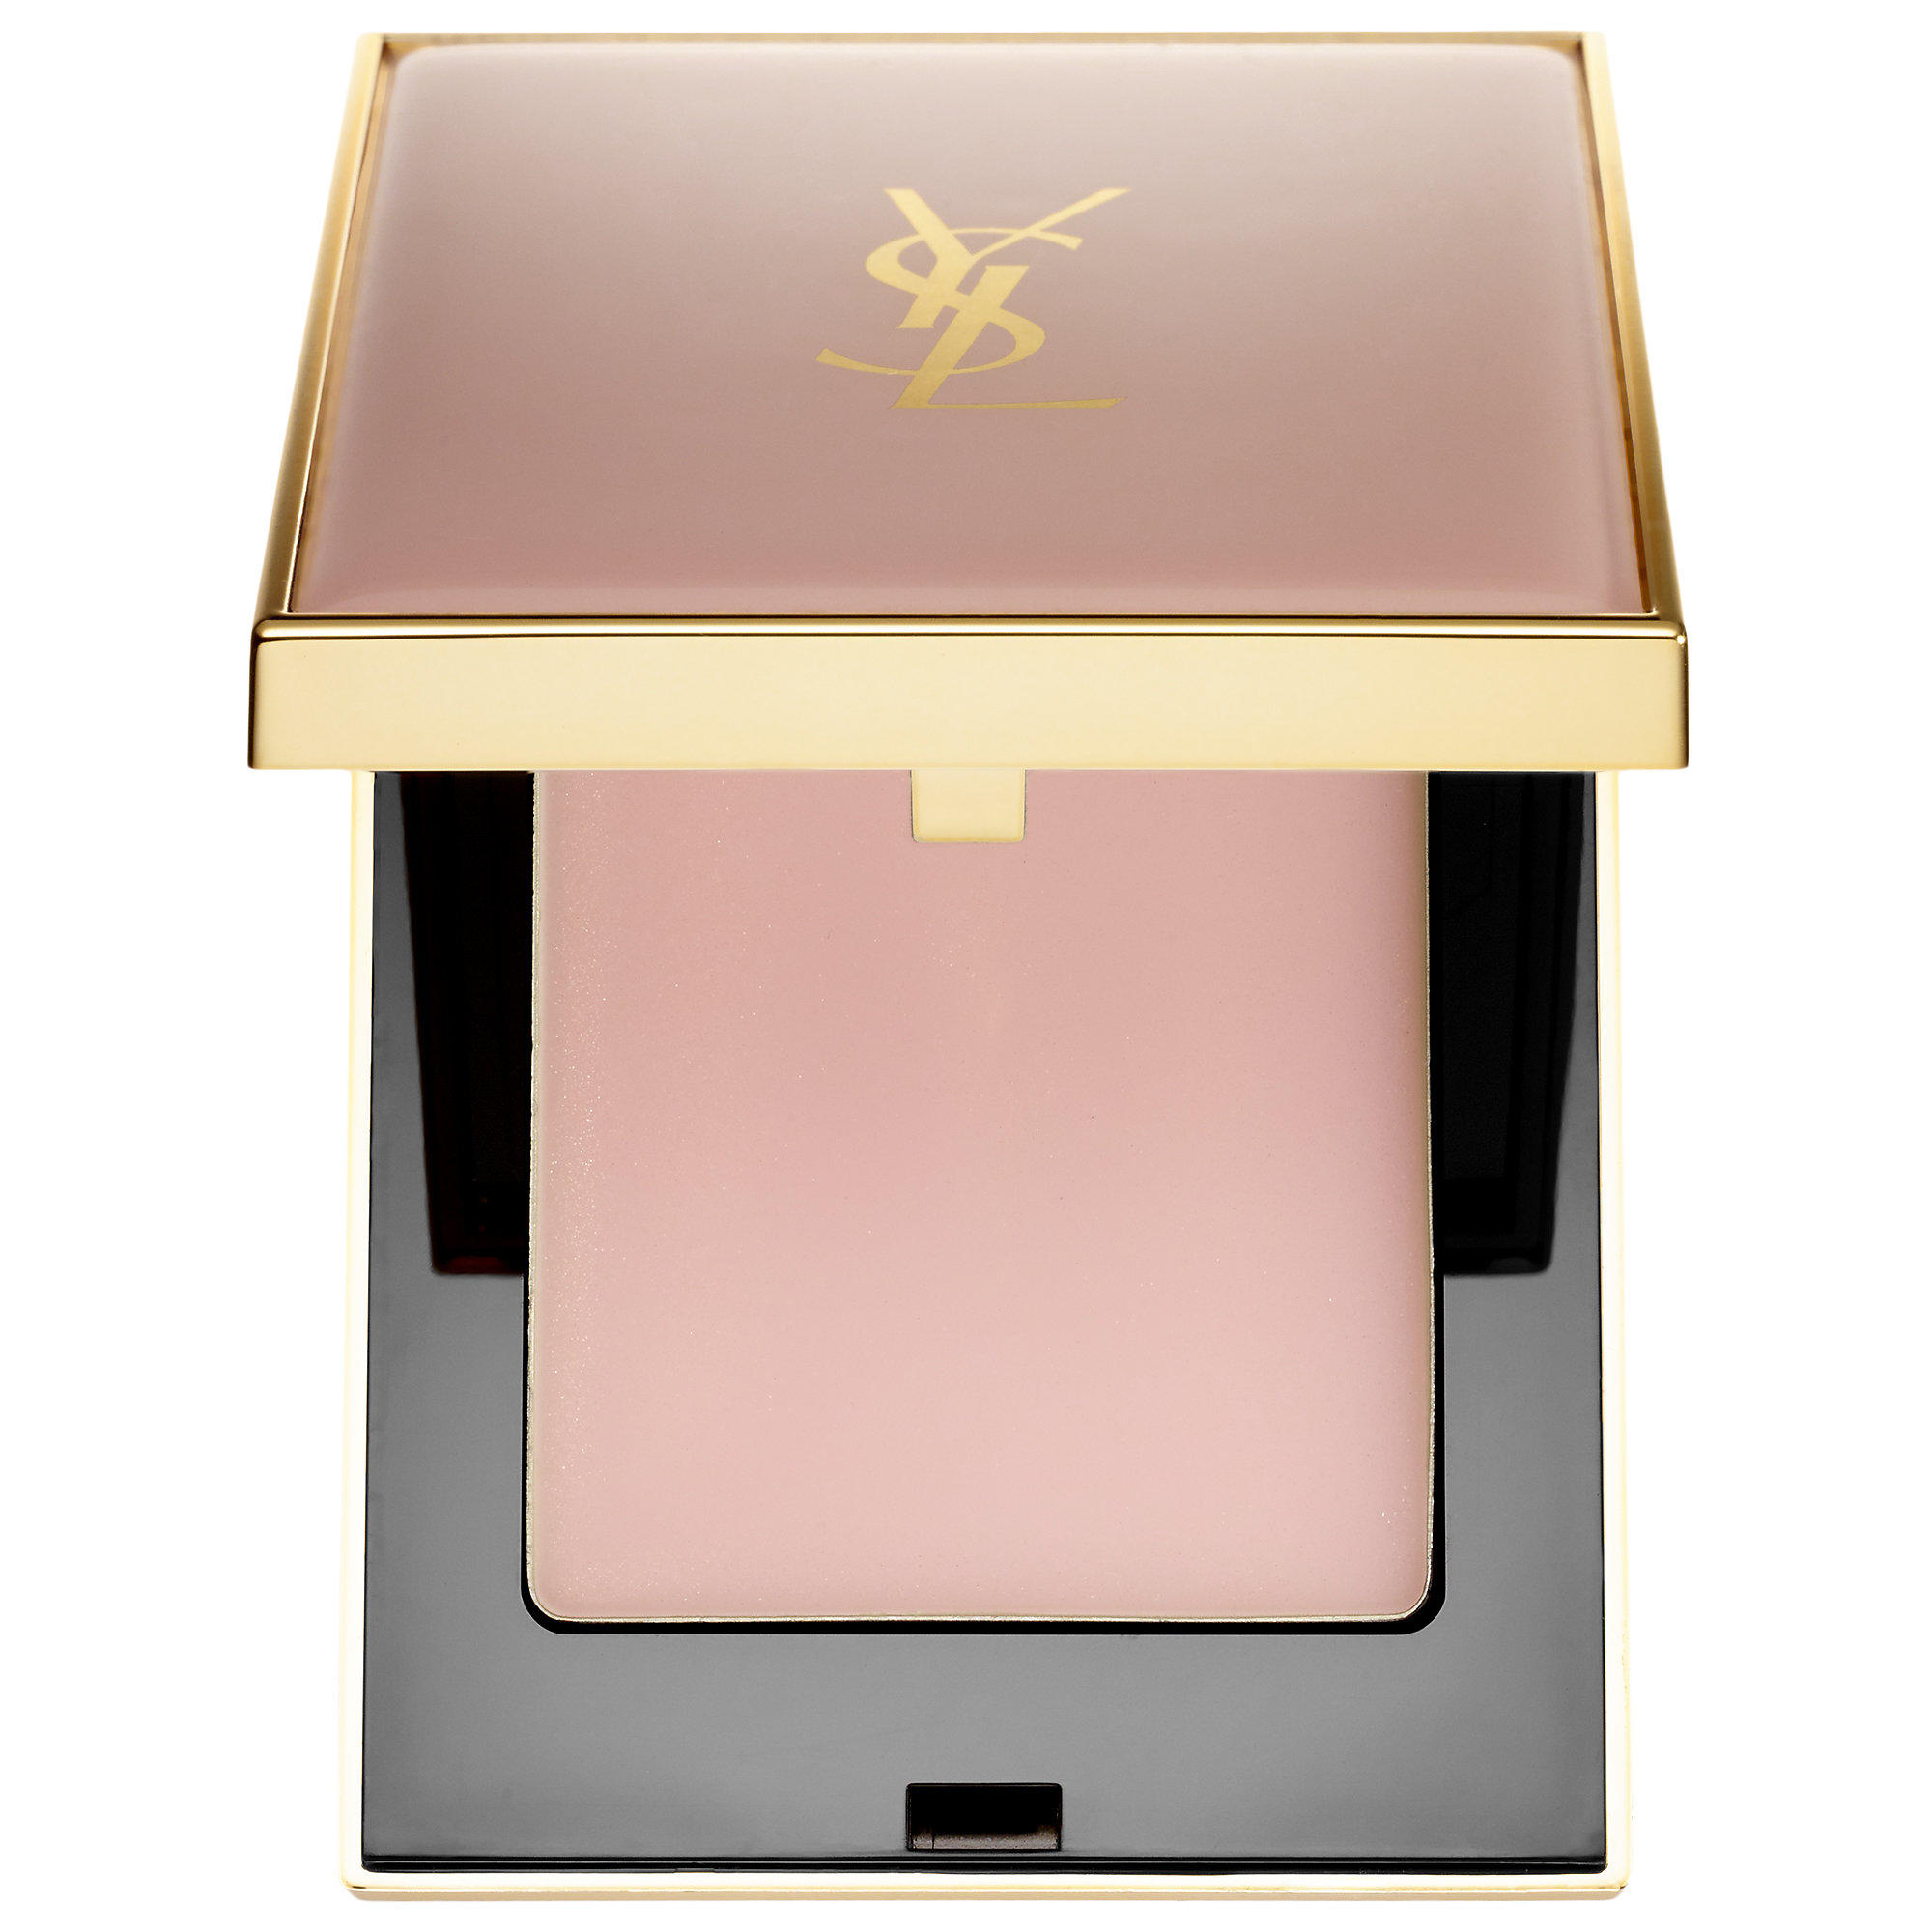 YSL Touche Eclat Blur Perfector Universal Balm-Powder Natural Rosy Glow